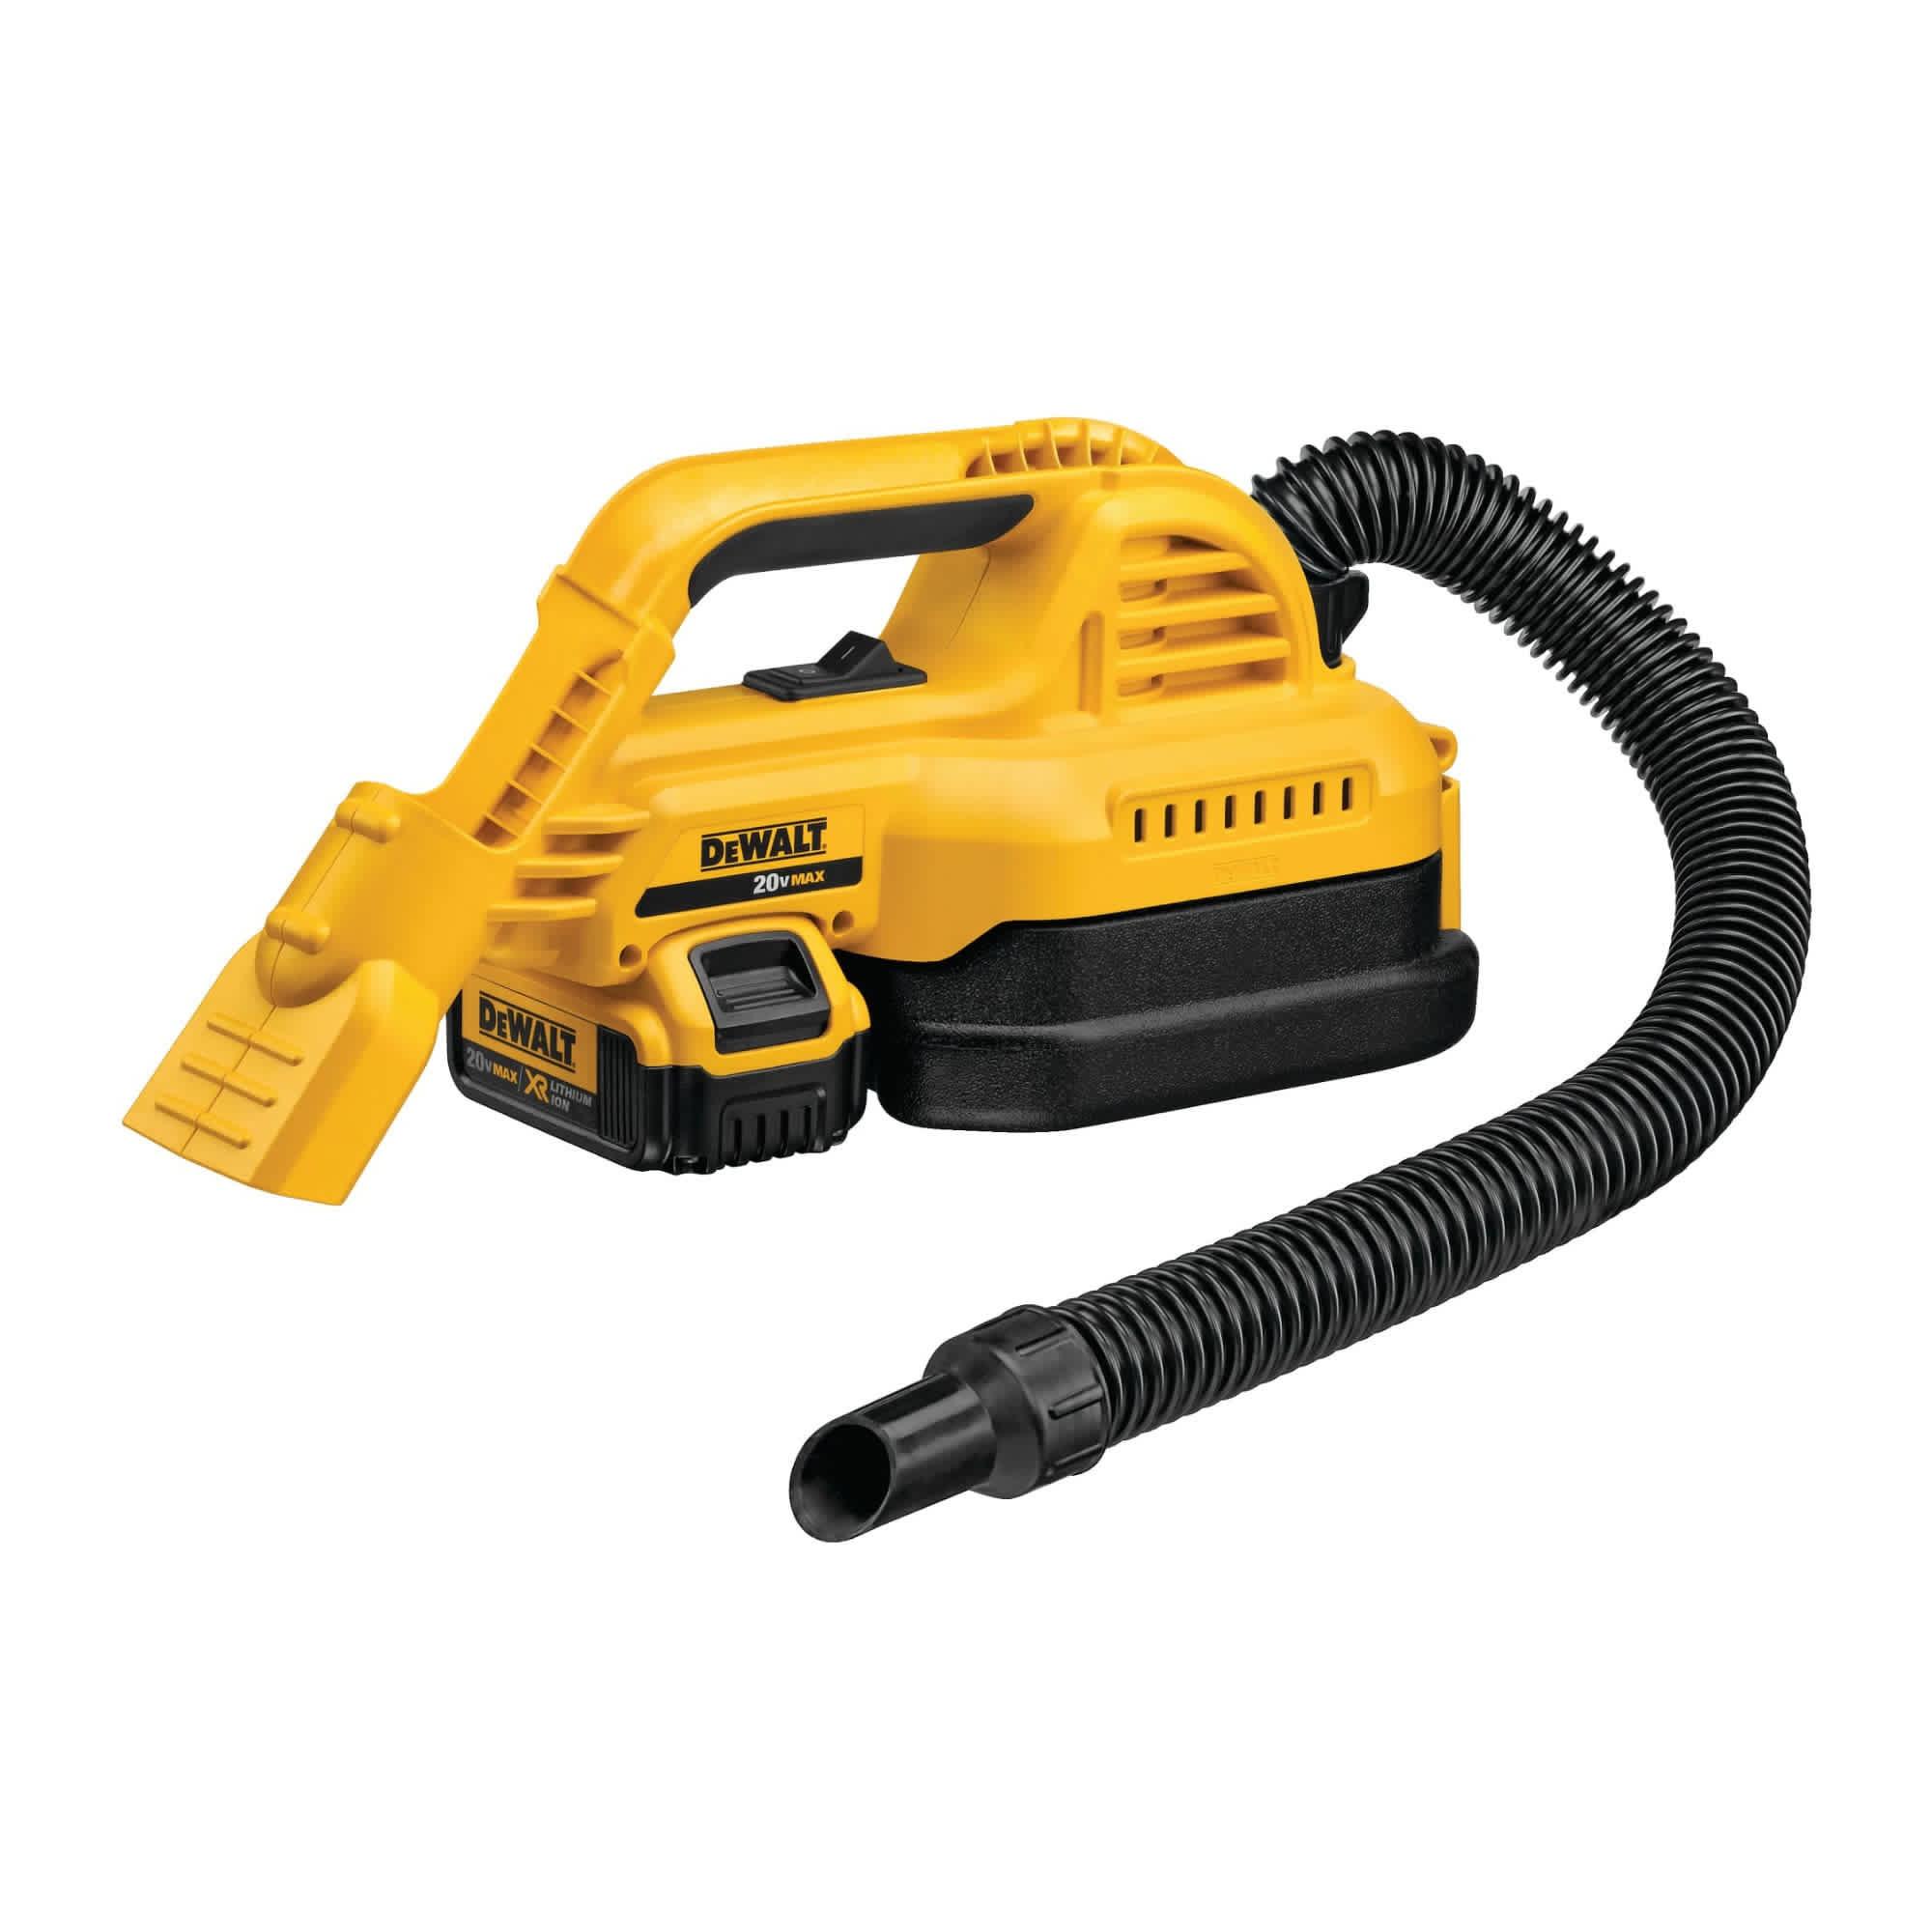 DeWalt 20V Max 1/2-Gallon Wet/Dry Portable Vacuum Kit